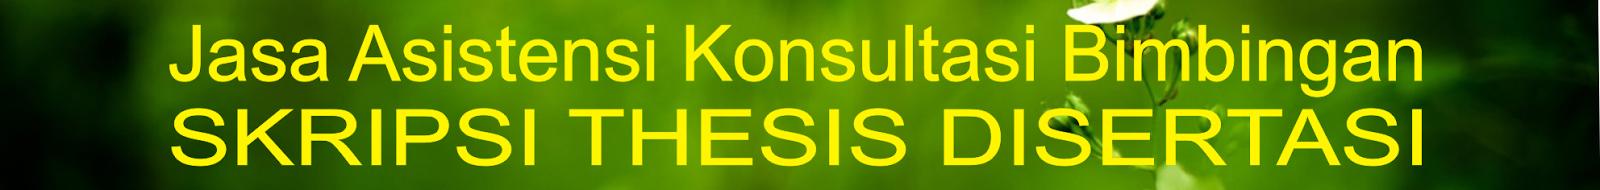 http://www.mitrariset.com/2014/10/bimbingan-ekslusif.html